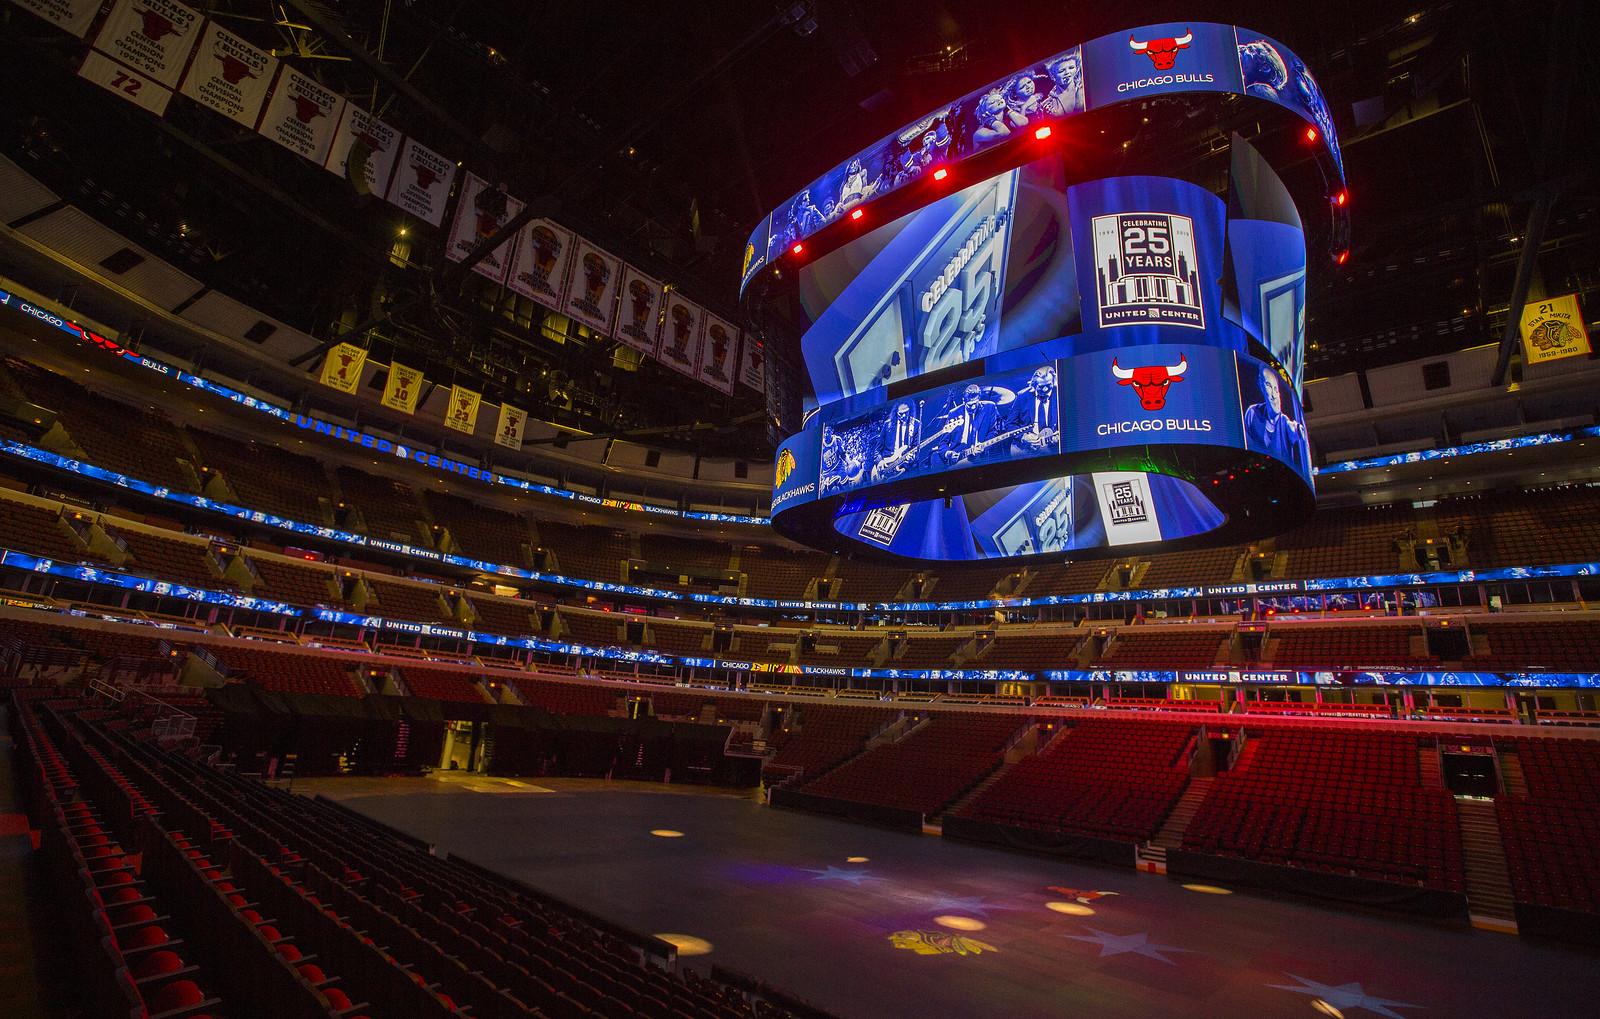 The new scoreboard inside the United Center.